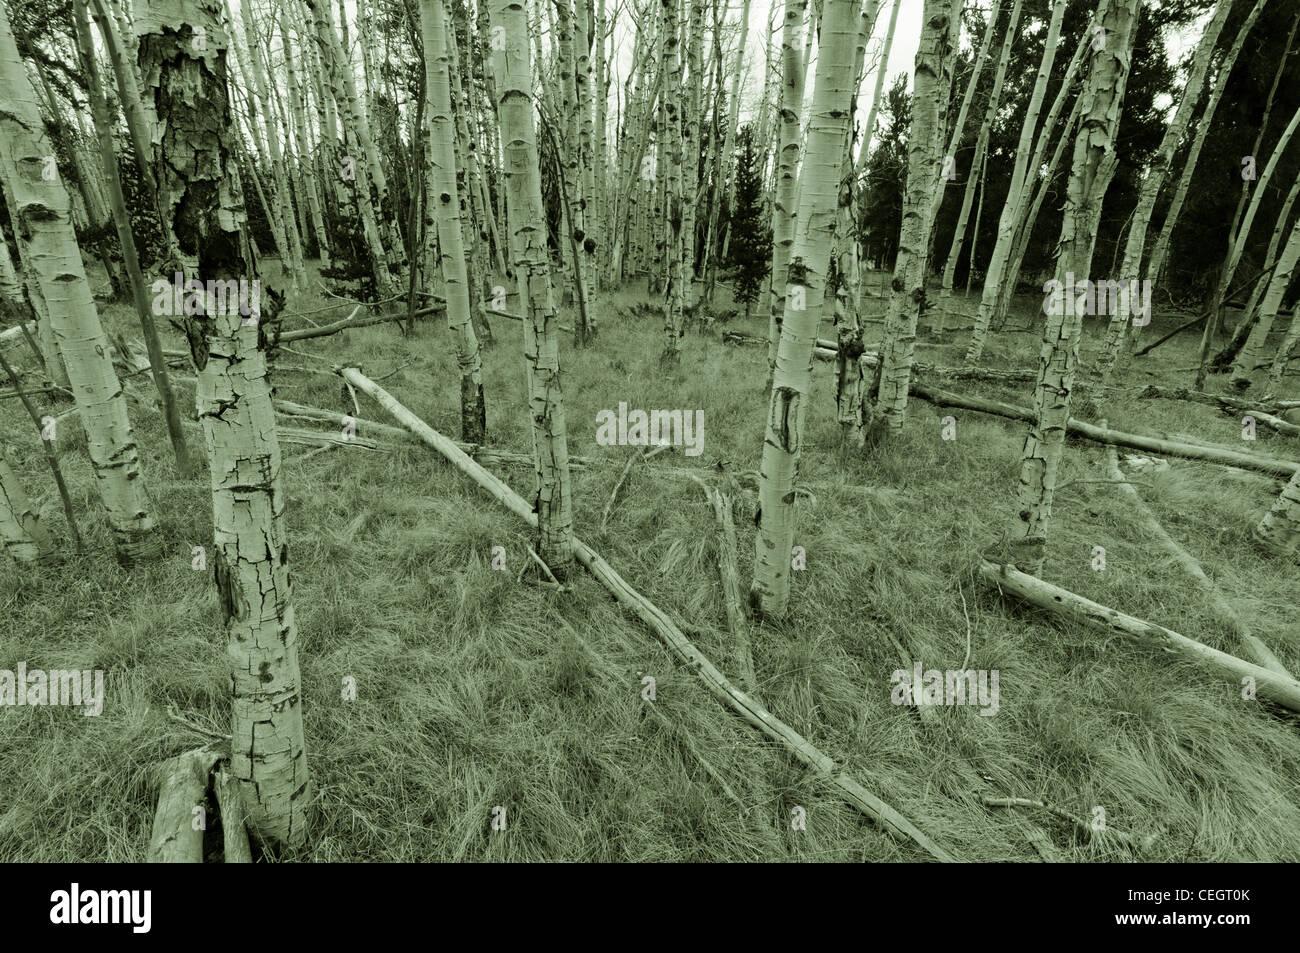 Aspen Woodlands in autumn, Fairplay, Colorado - Stock Image